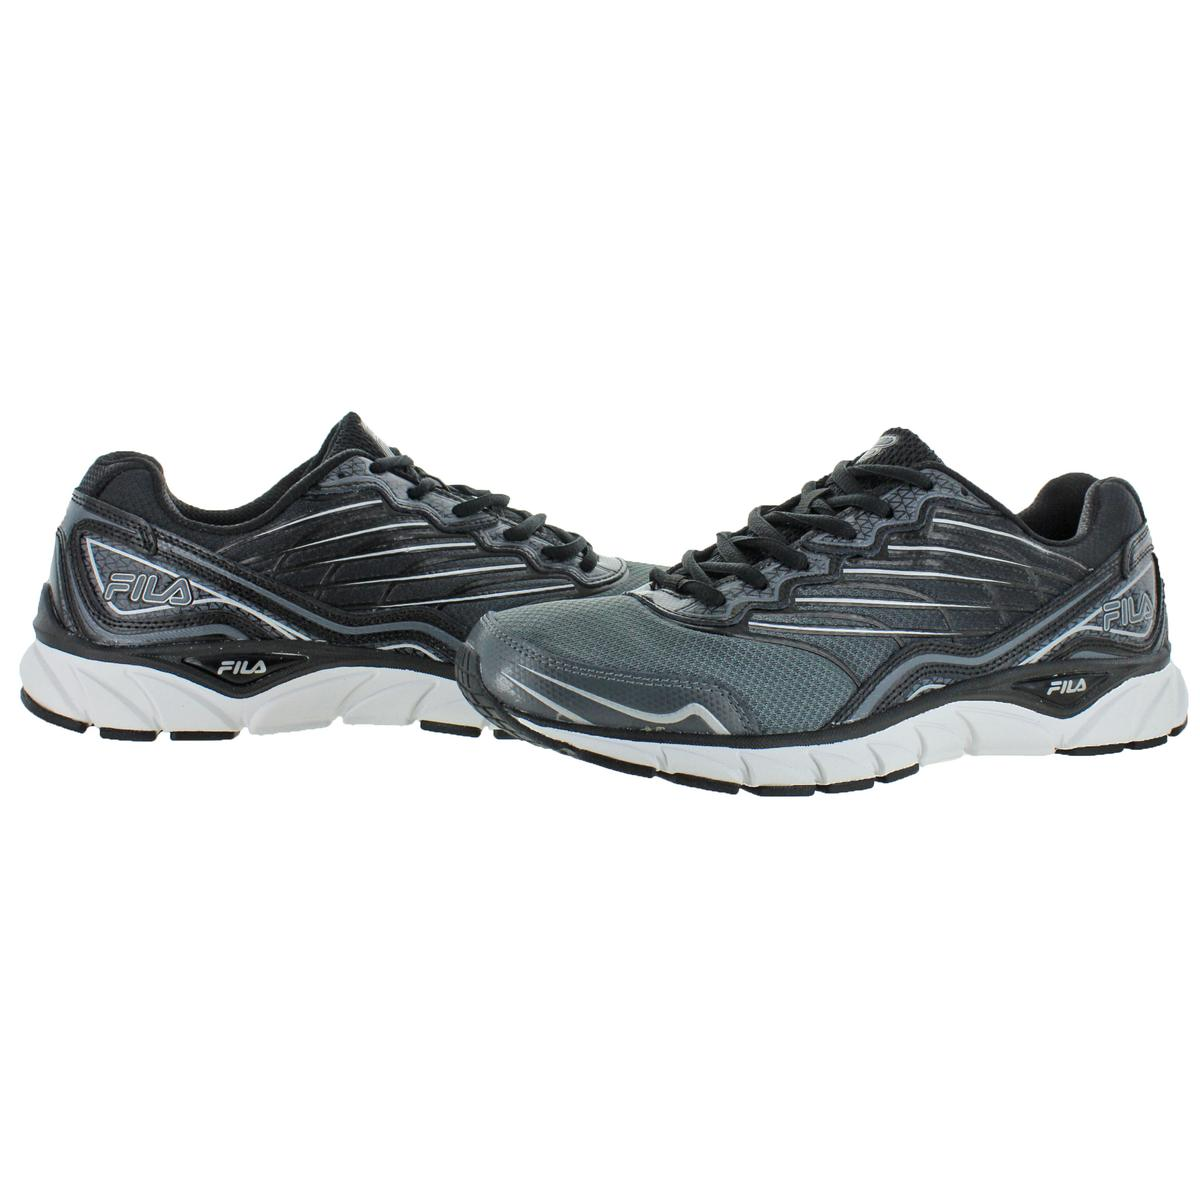 Fila Mens Memory Countdown 3 Black Running Shoes 10.5 Medium (D ... b8e1a44ef